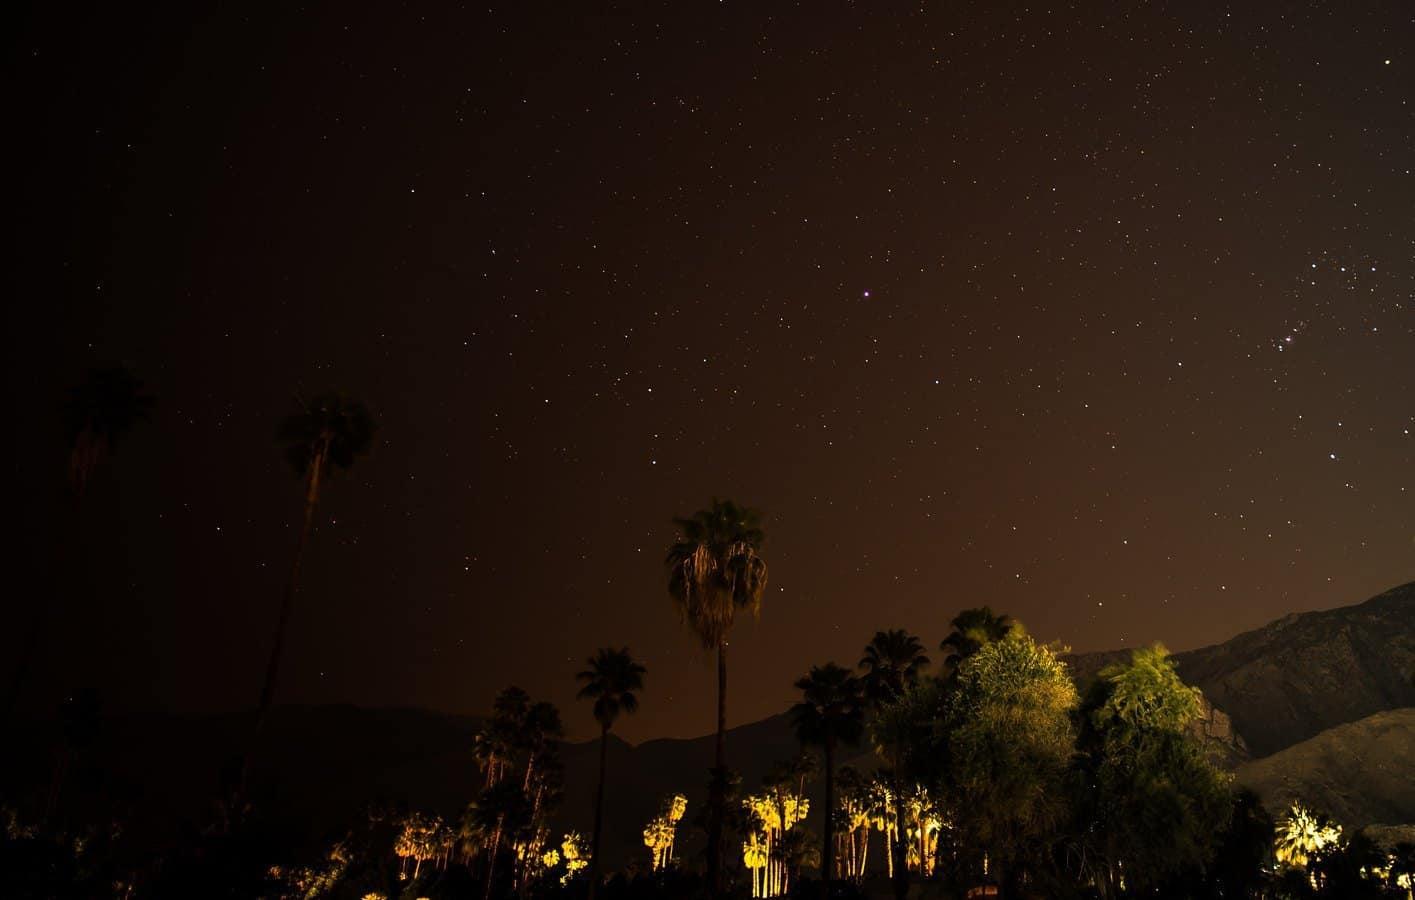 Stargazing in Palm Springs - Grempz via Flickr